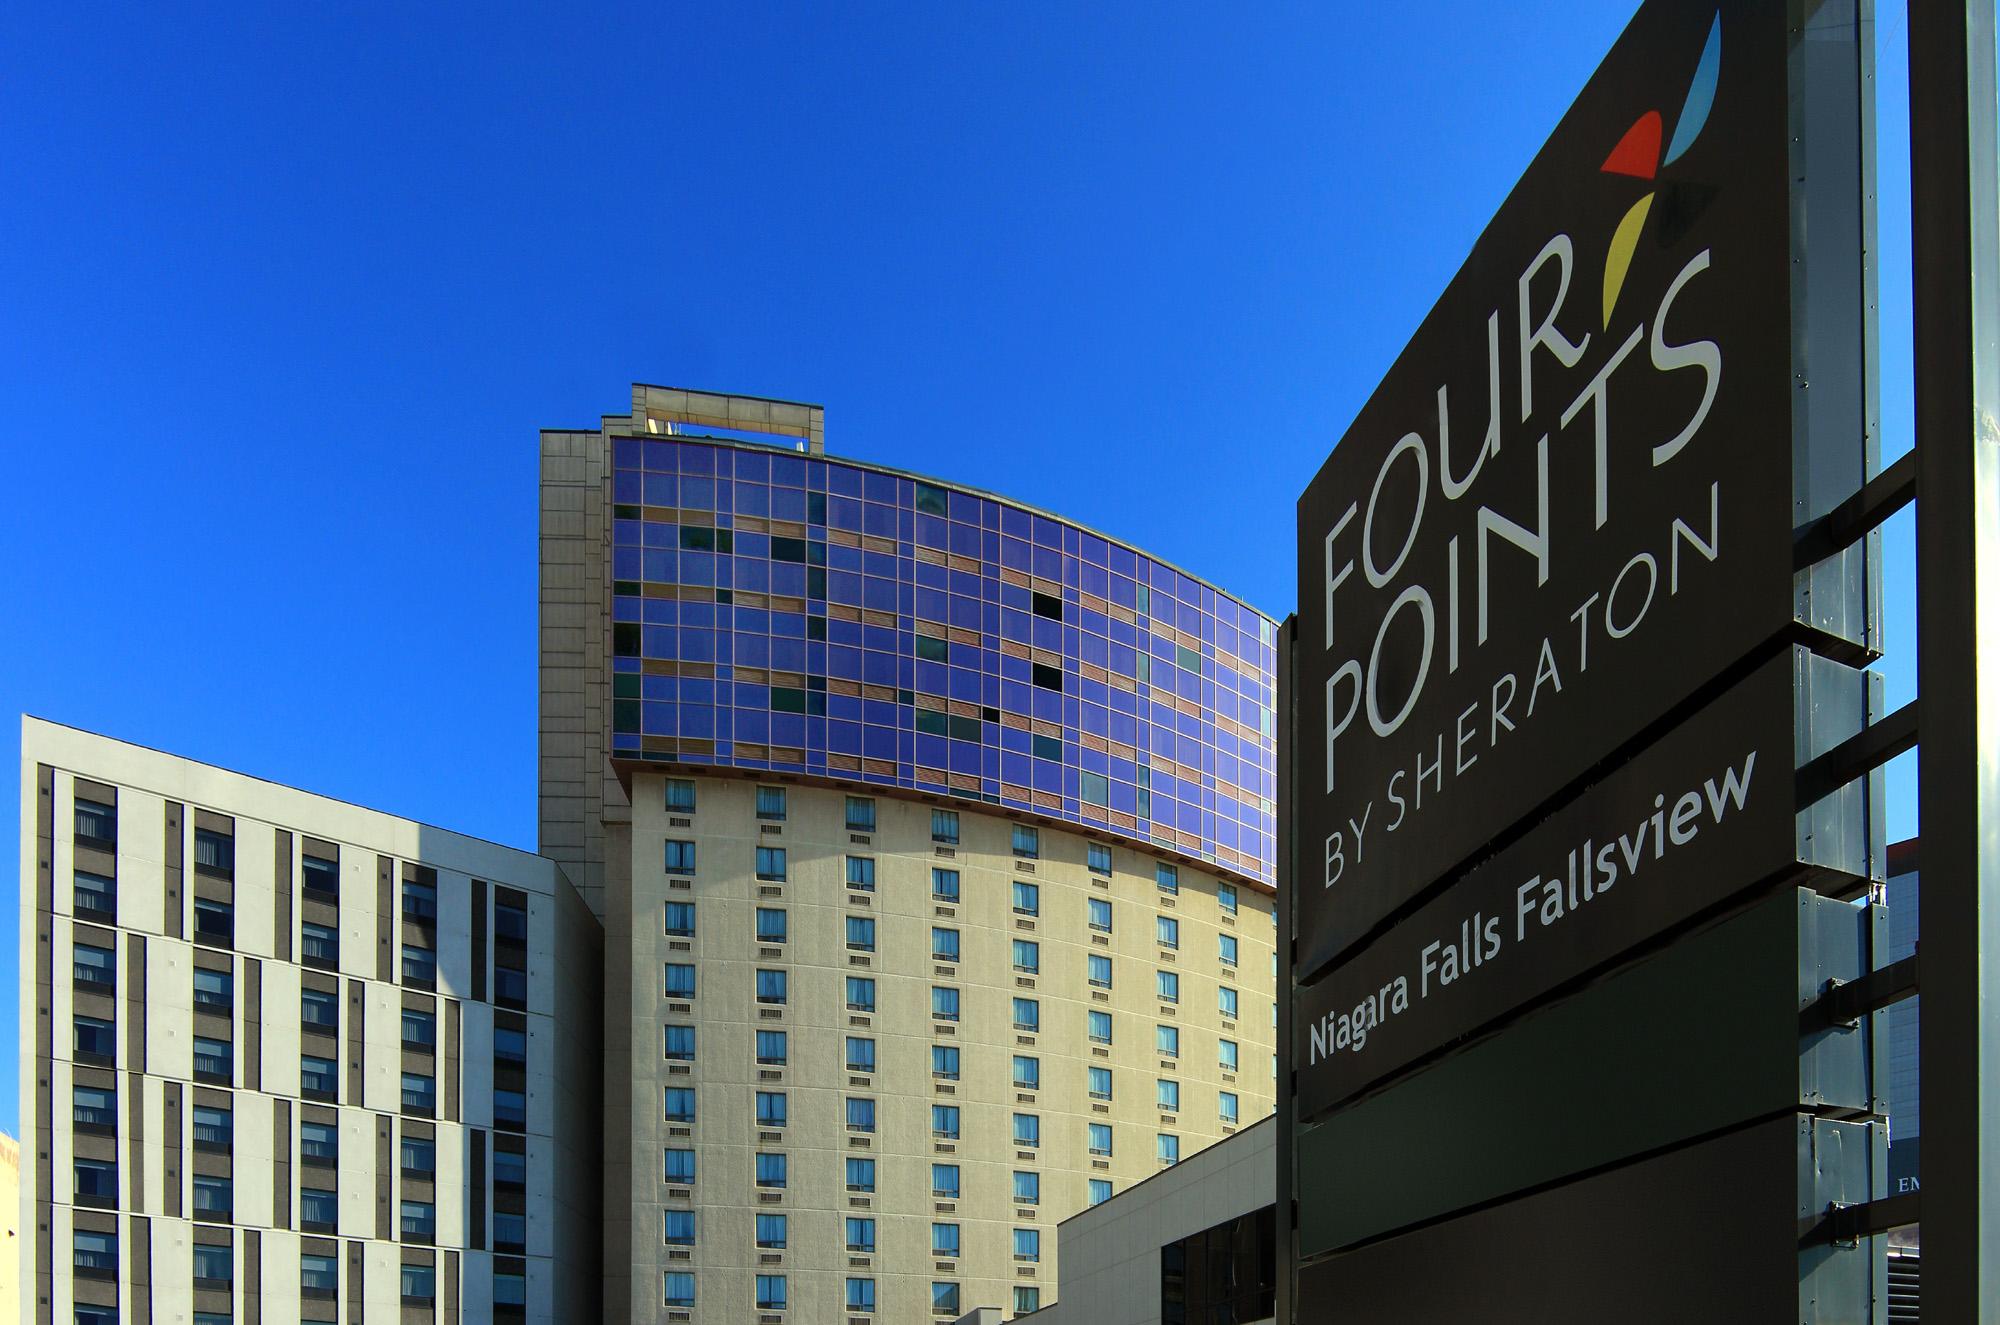 Four Points by Sheraton Niagara Falls - Wikipedia